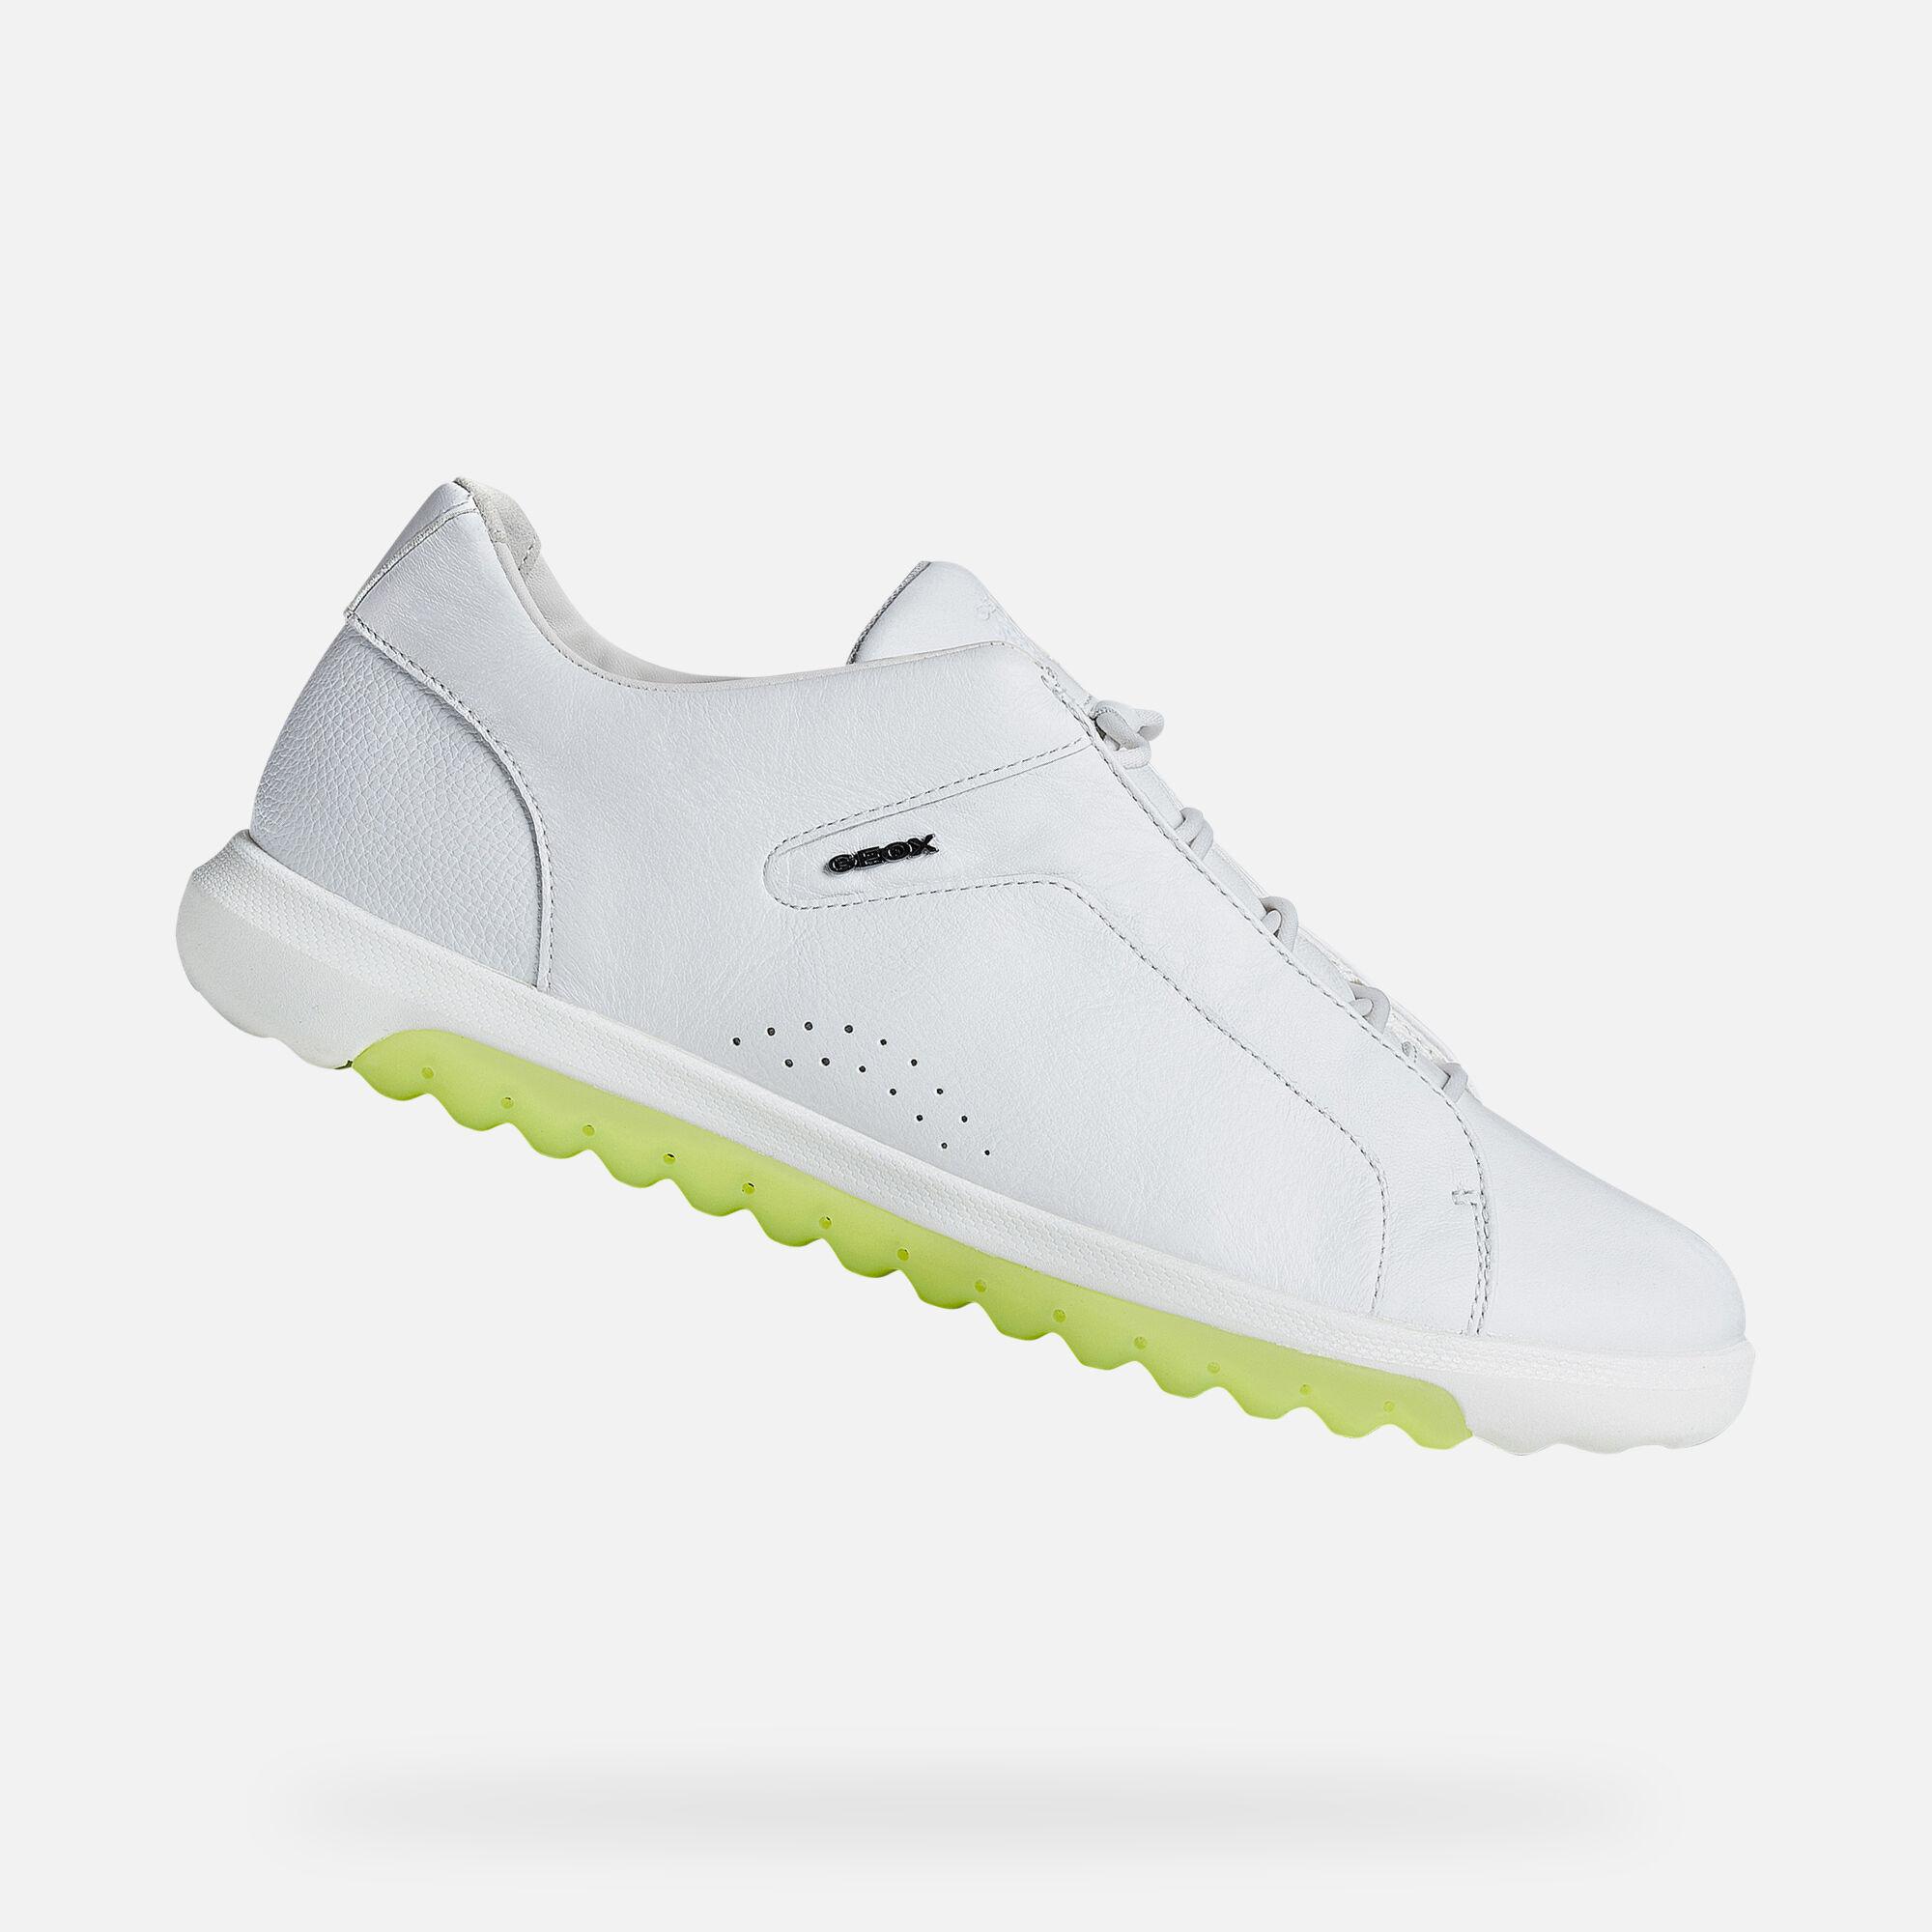 Geox NEXSIDE Man: White Sneakers | Geox